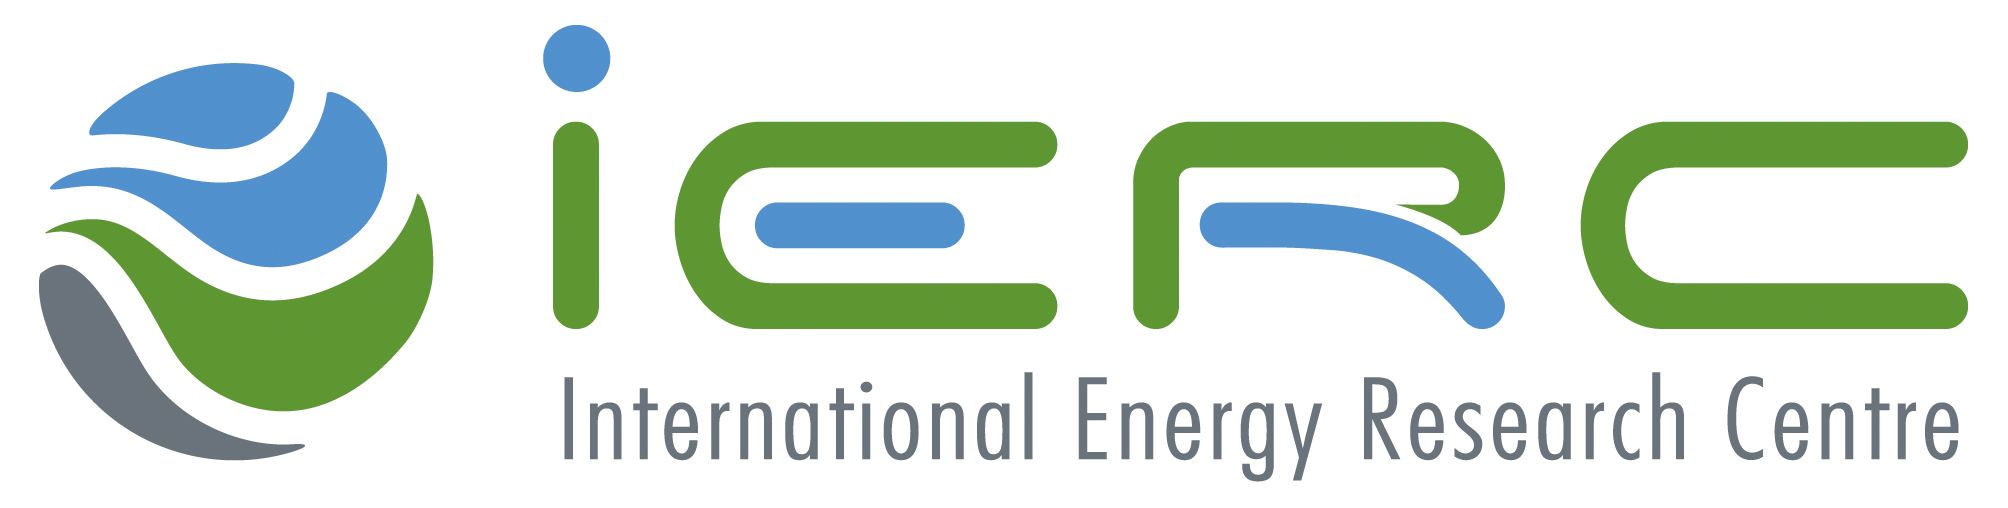 IERC Logo.png